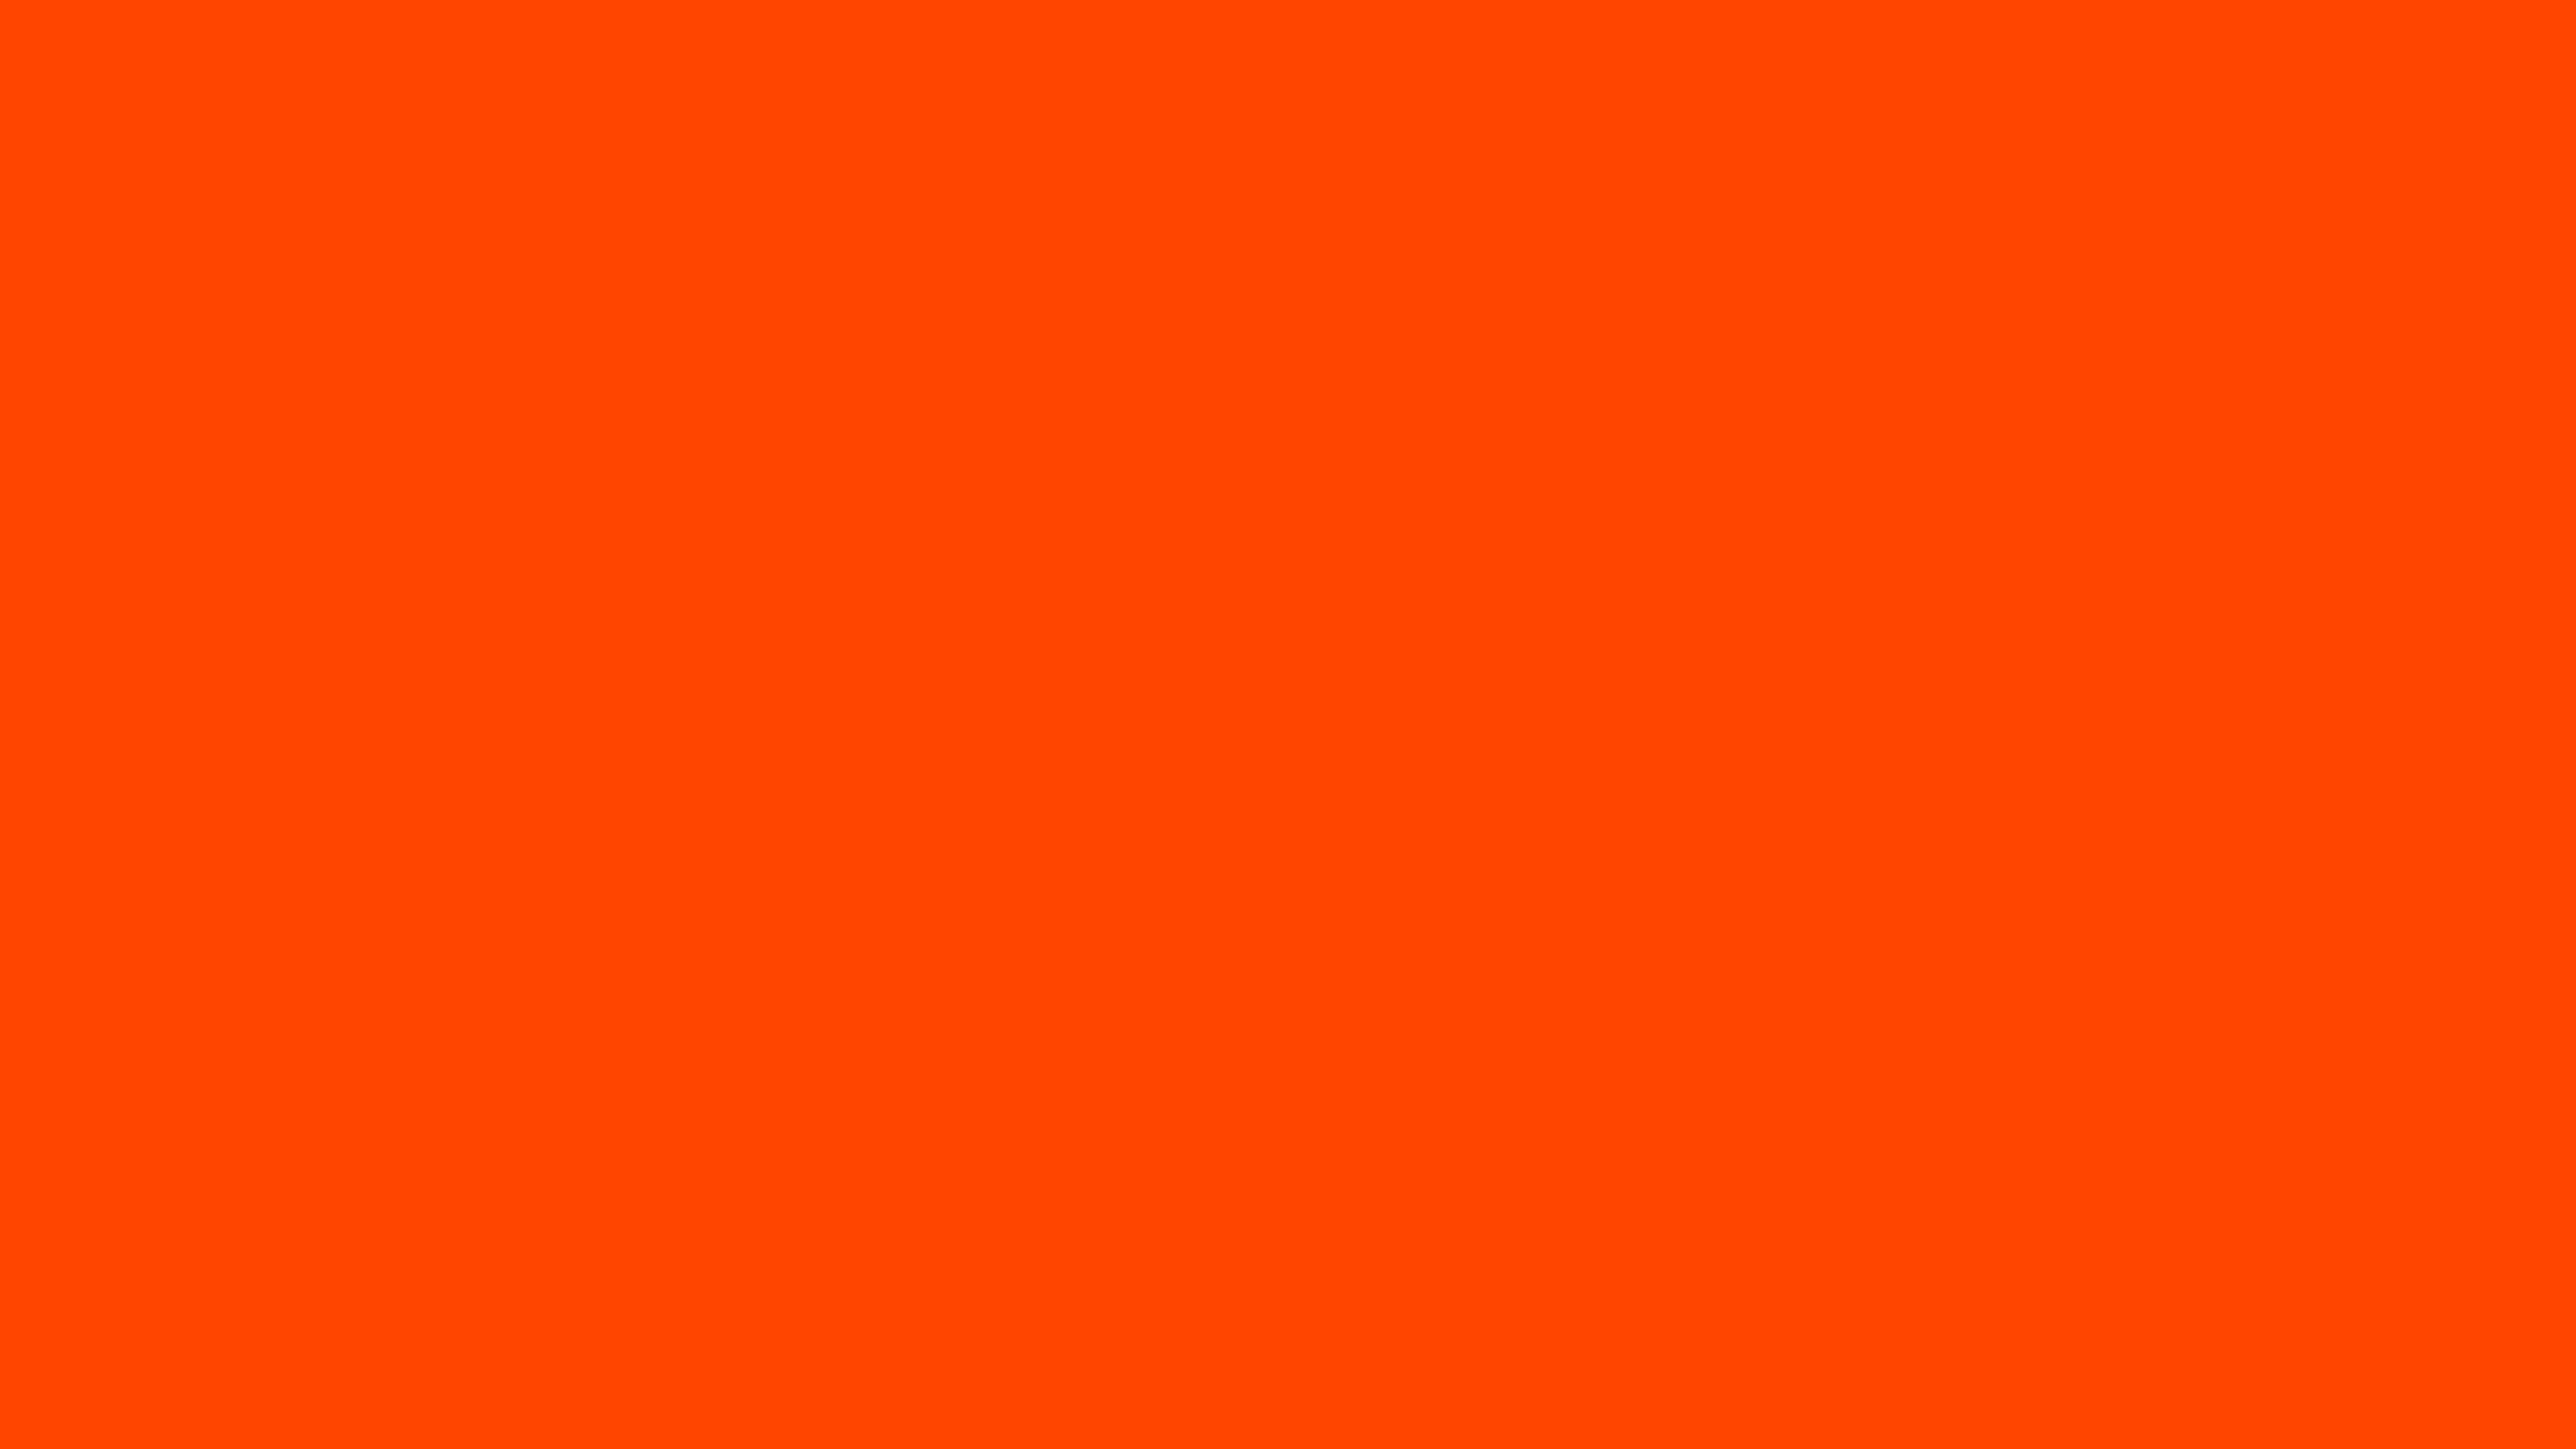 4096x2304 Orange-red Solid Color Background